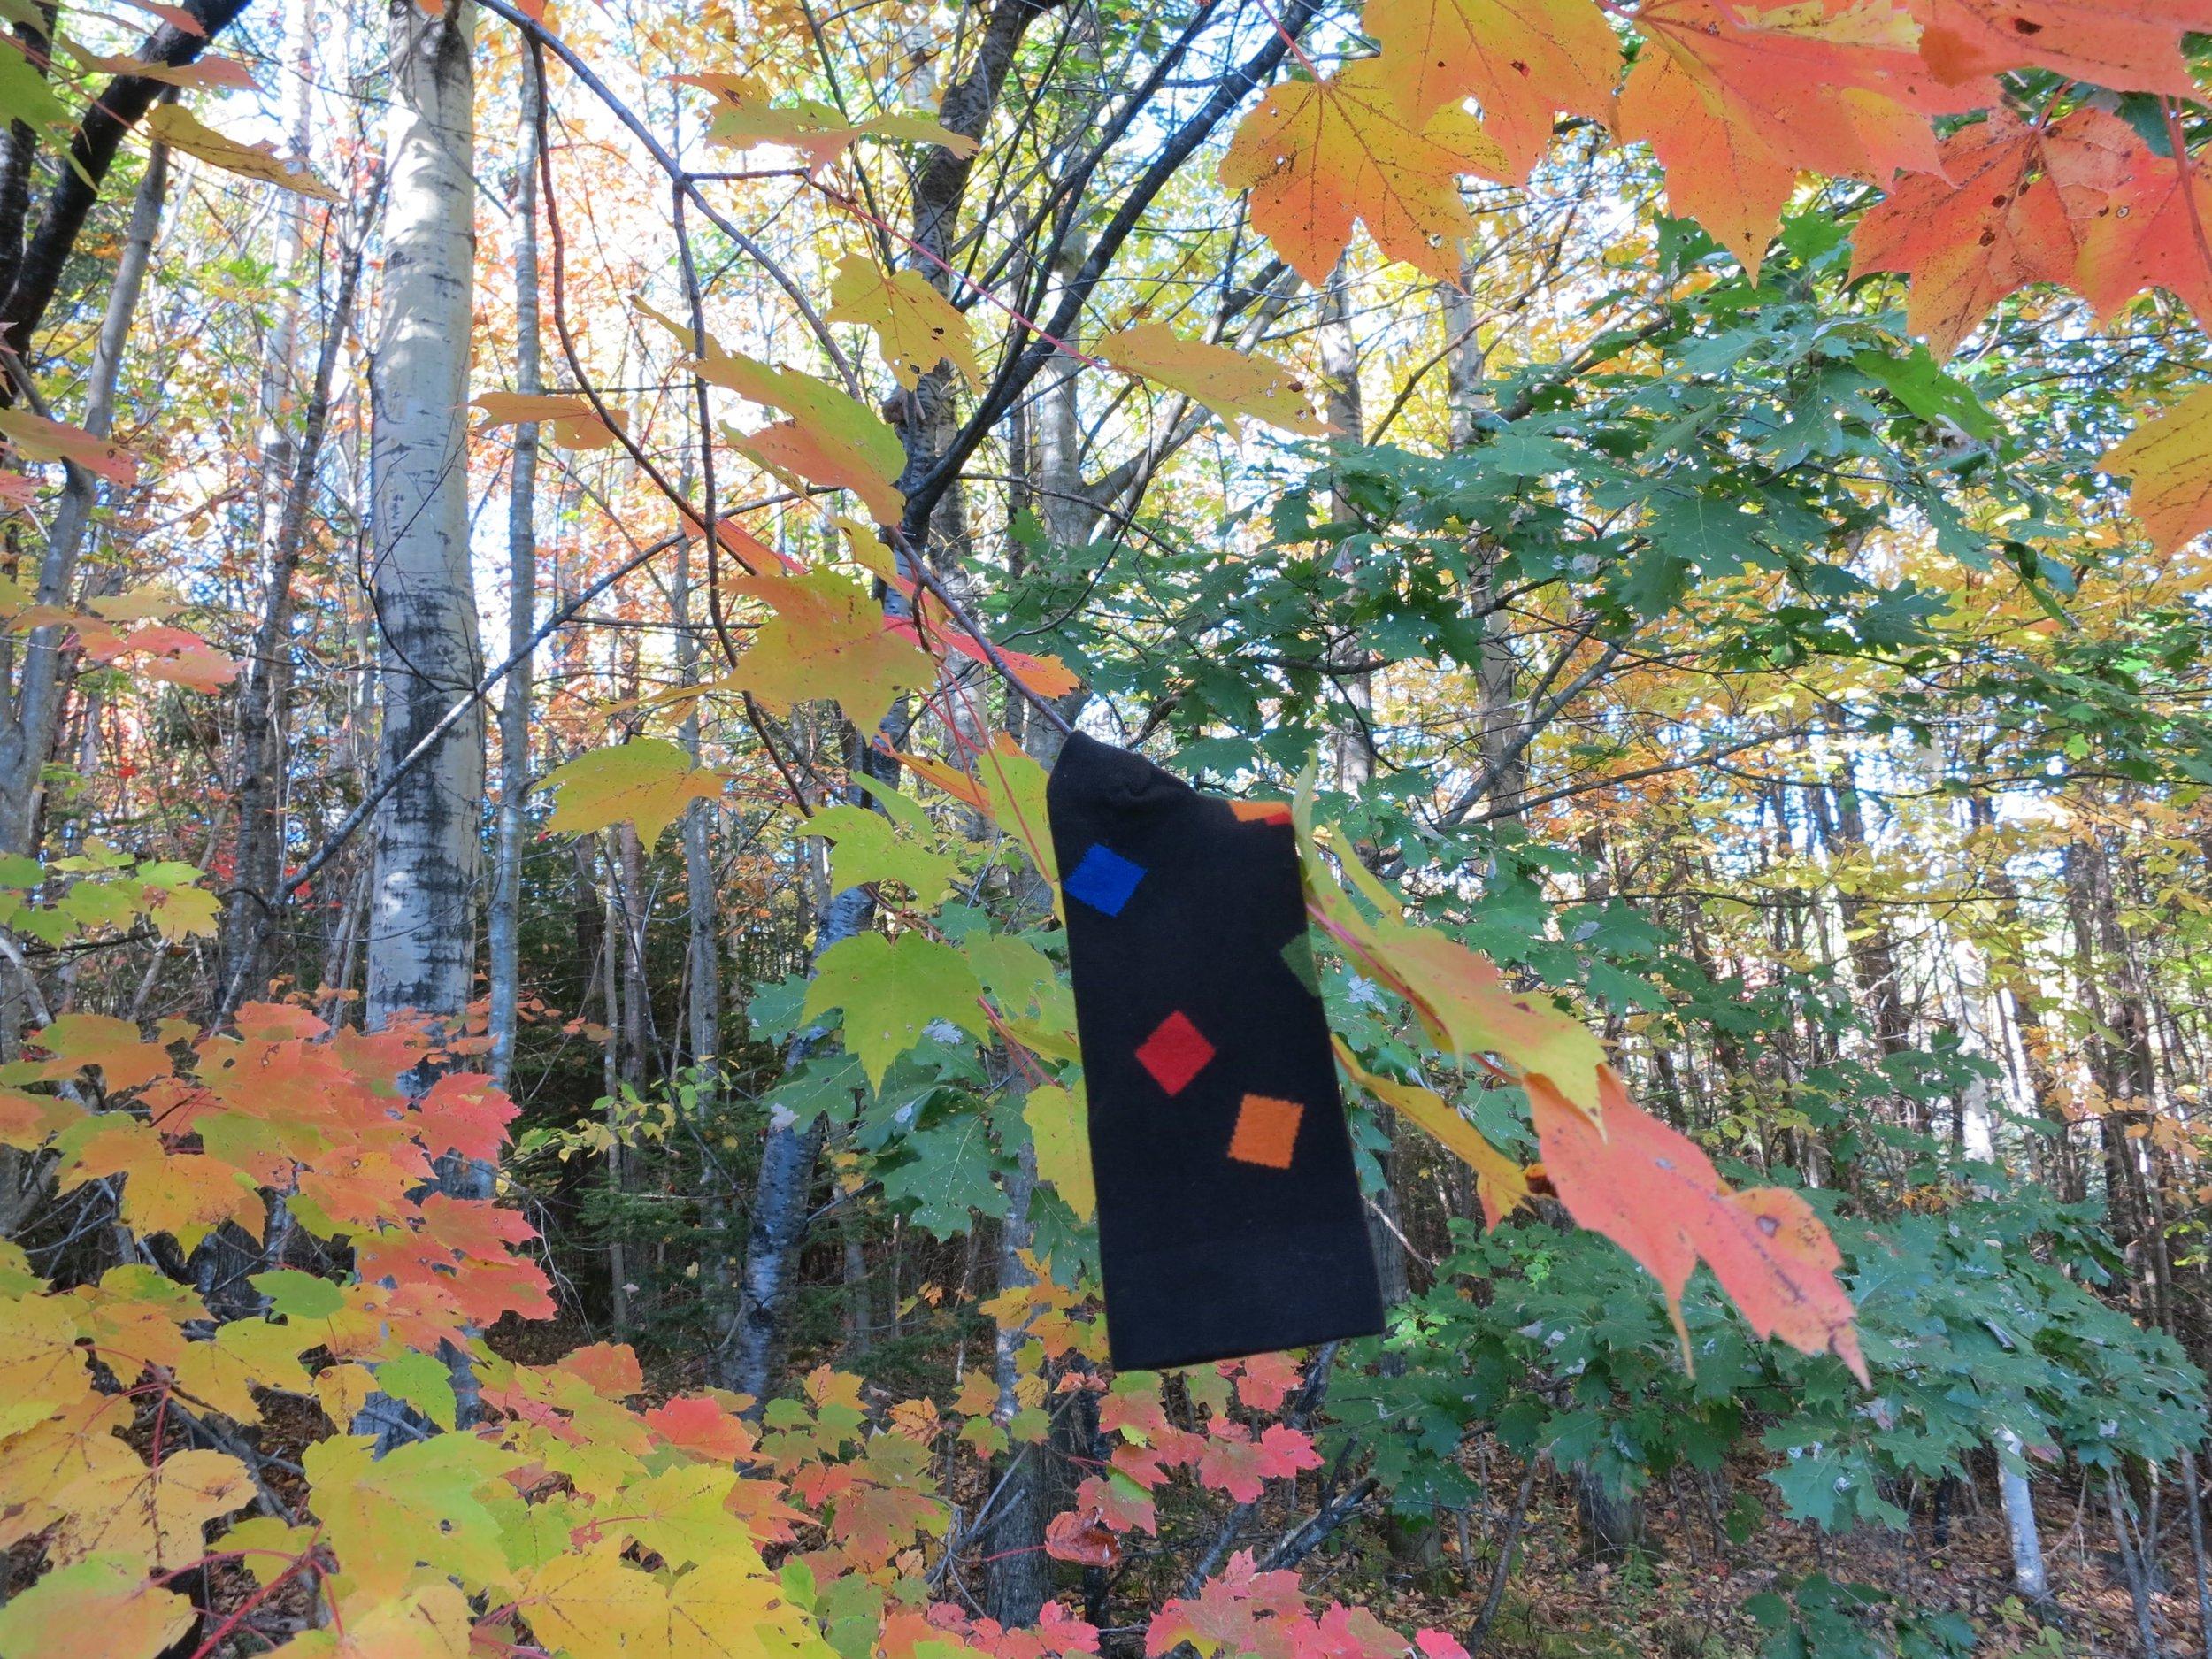 CONFETTI amid the leaves